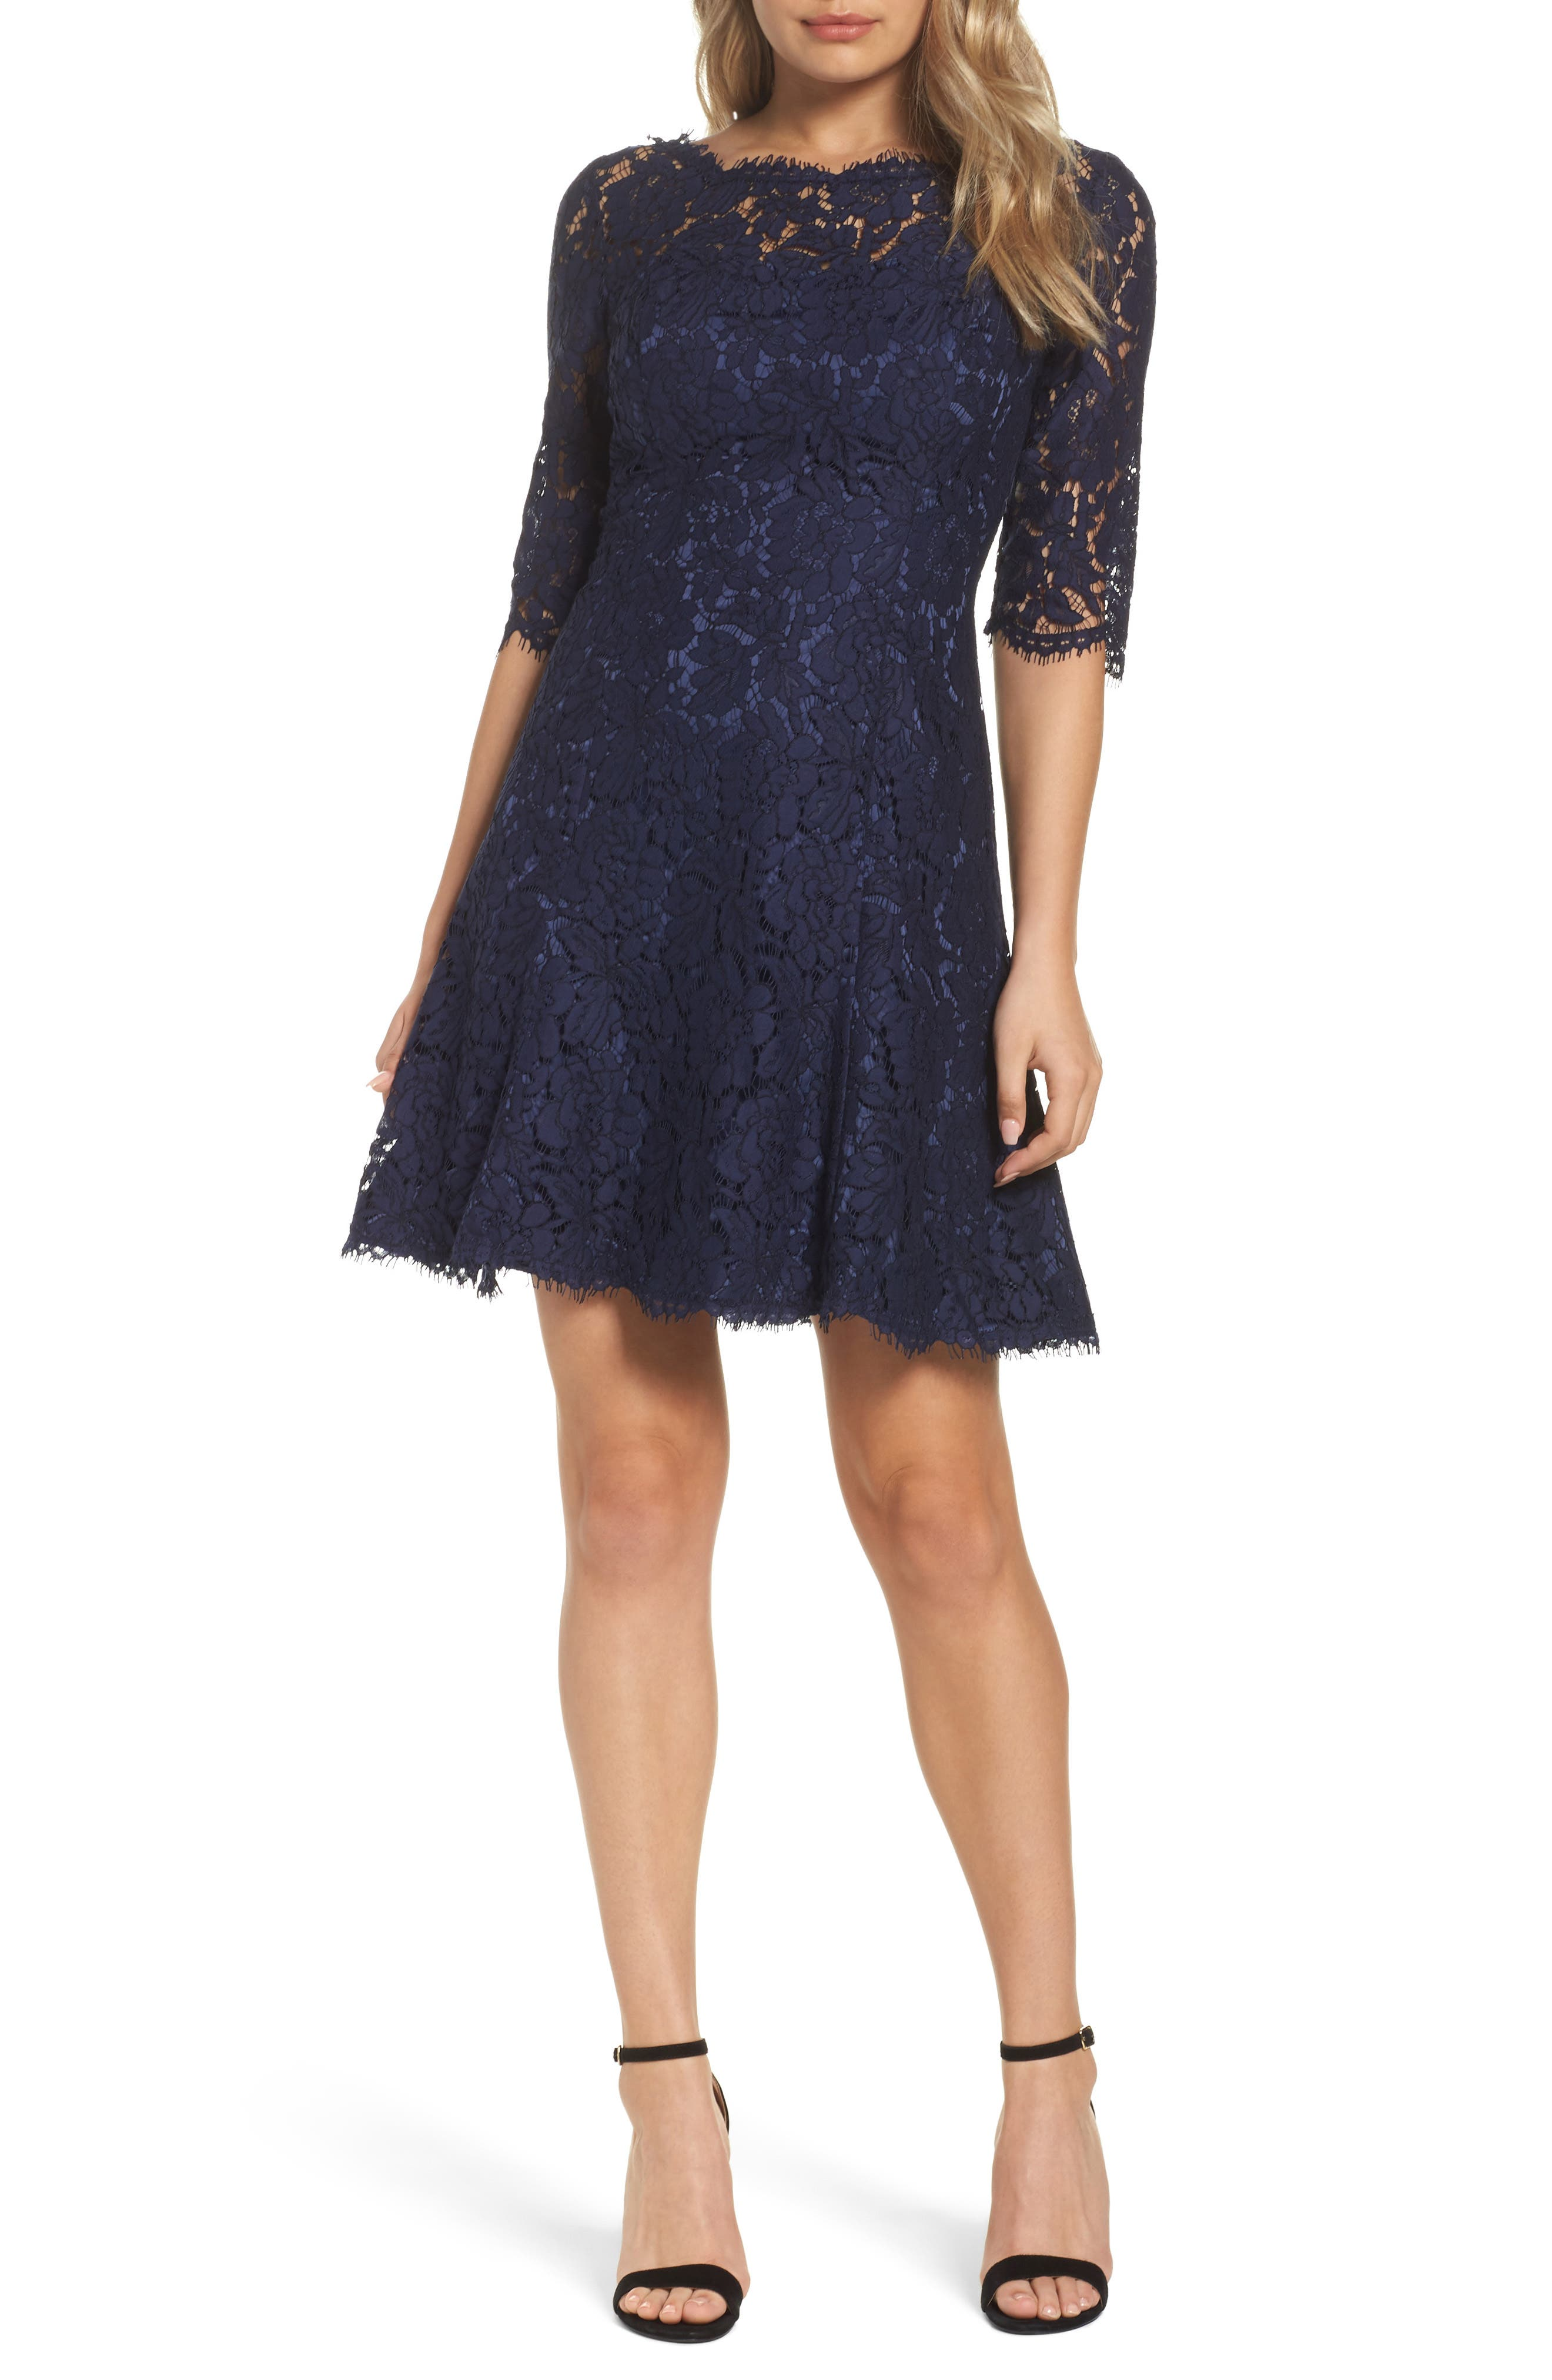 Eliza J Lace Fit & Flare Cocktail Dress, Blue